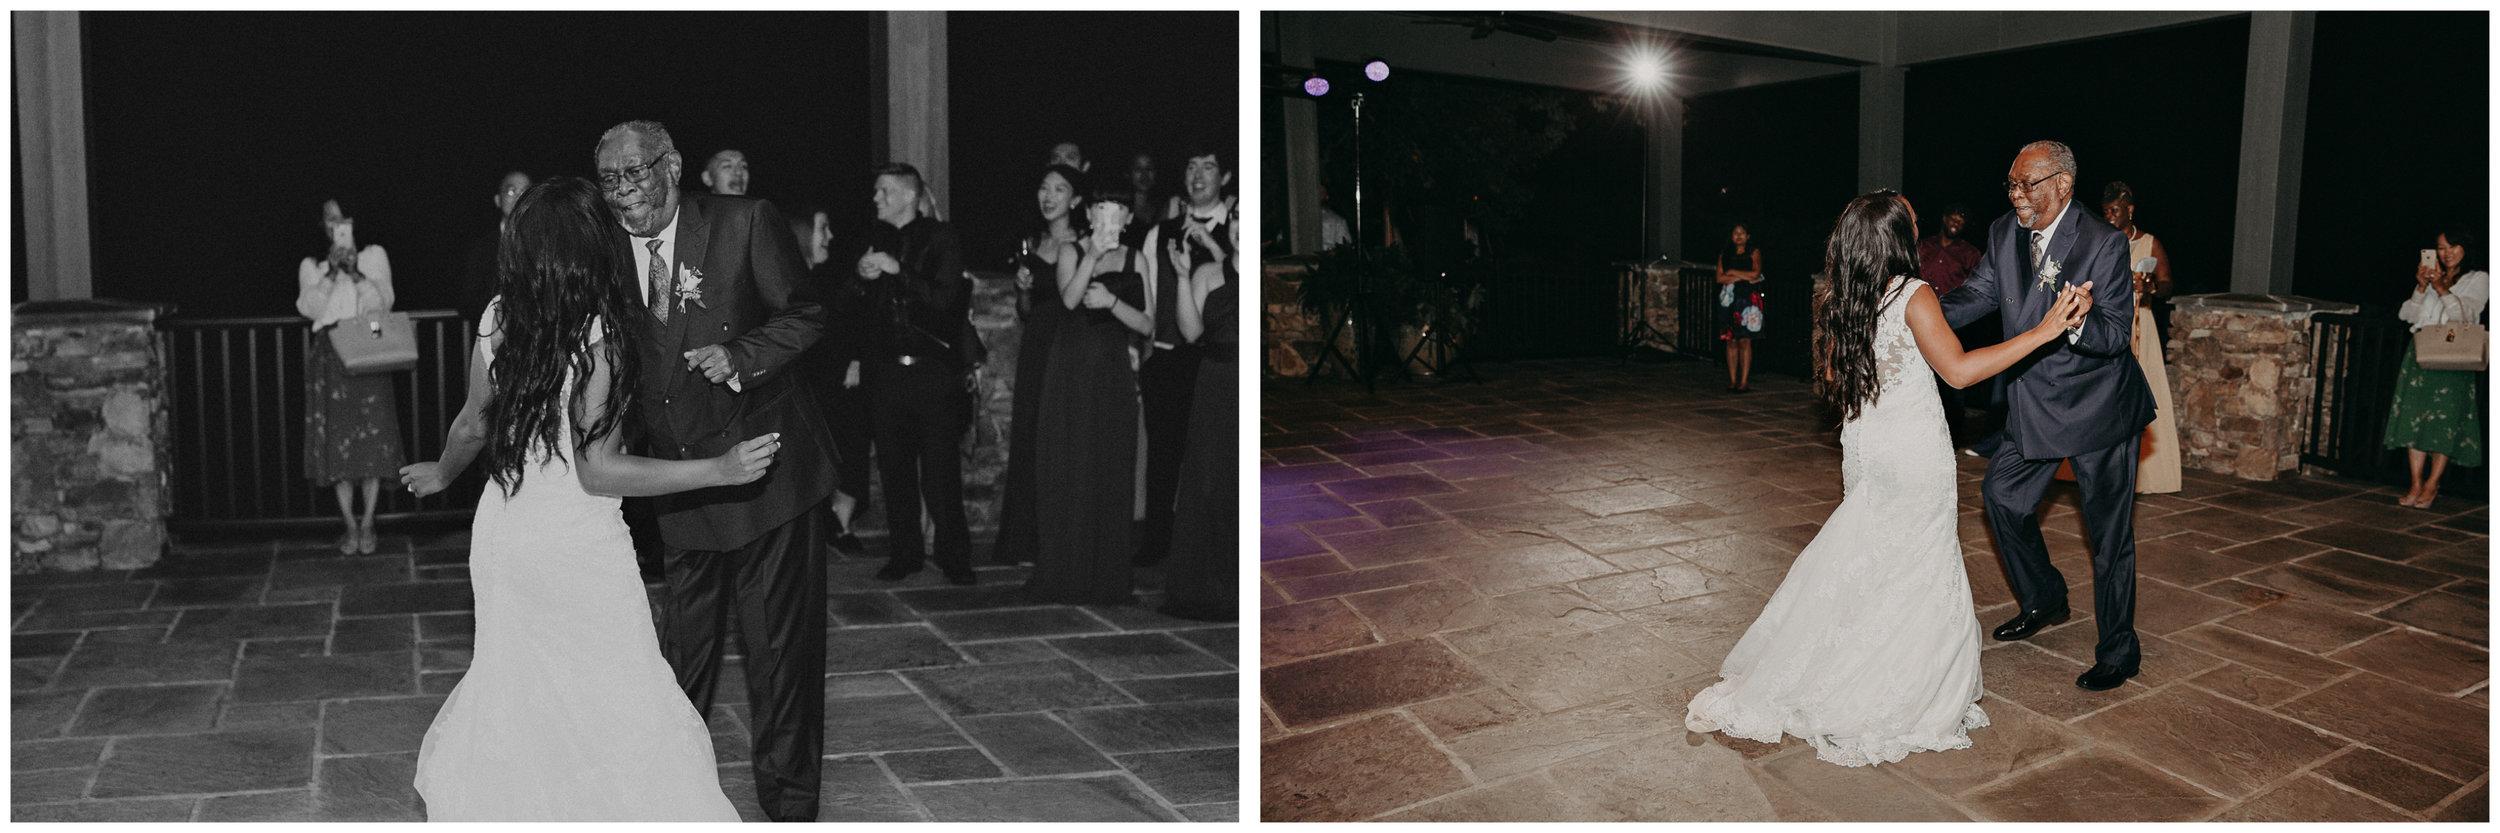 92- Kaya_vineyard_dahlonega_wedding_venue_detais_reception_aline_marin_photography.jpg